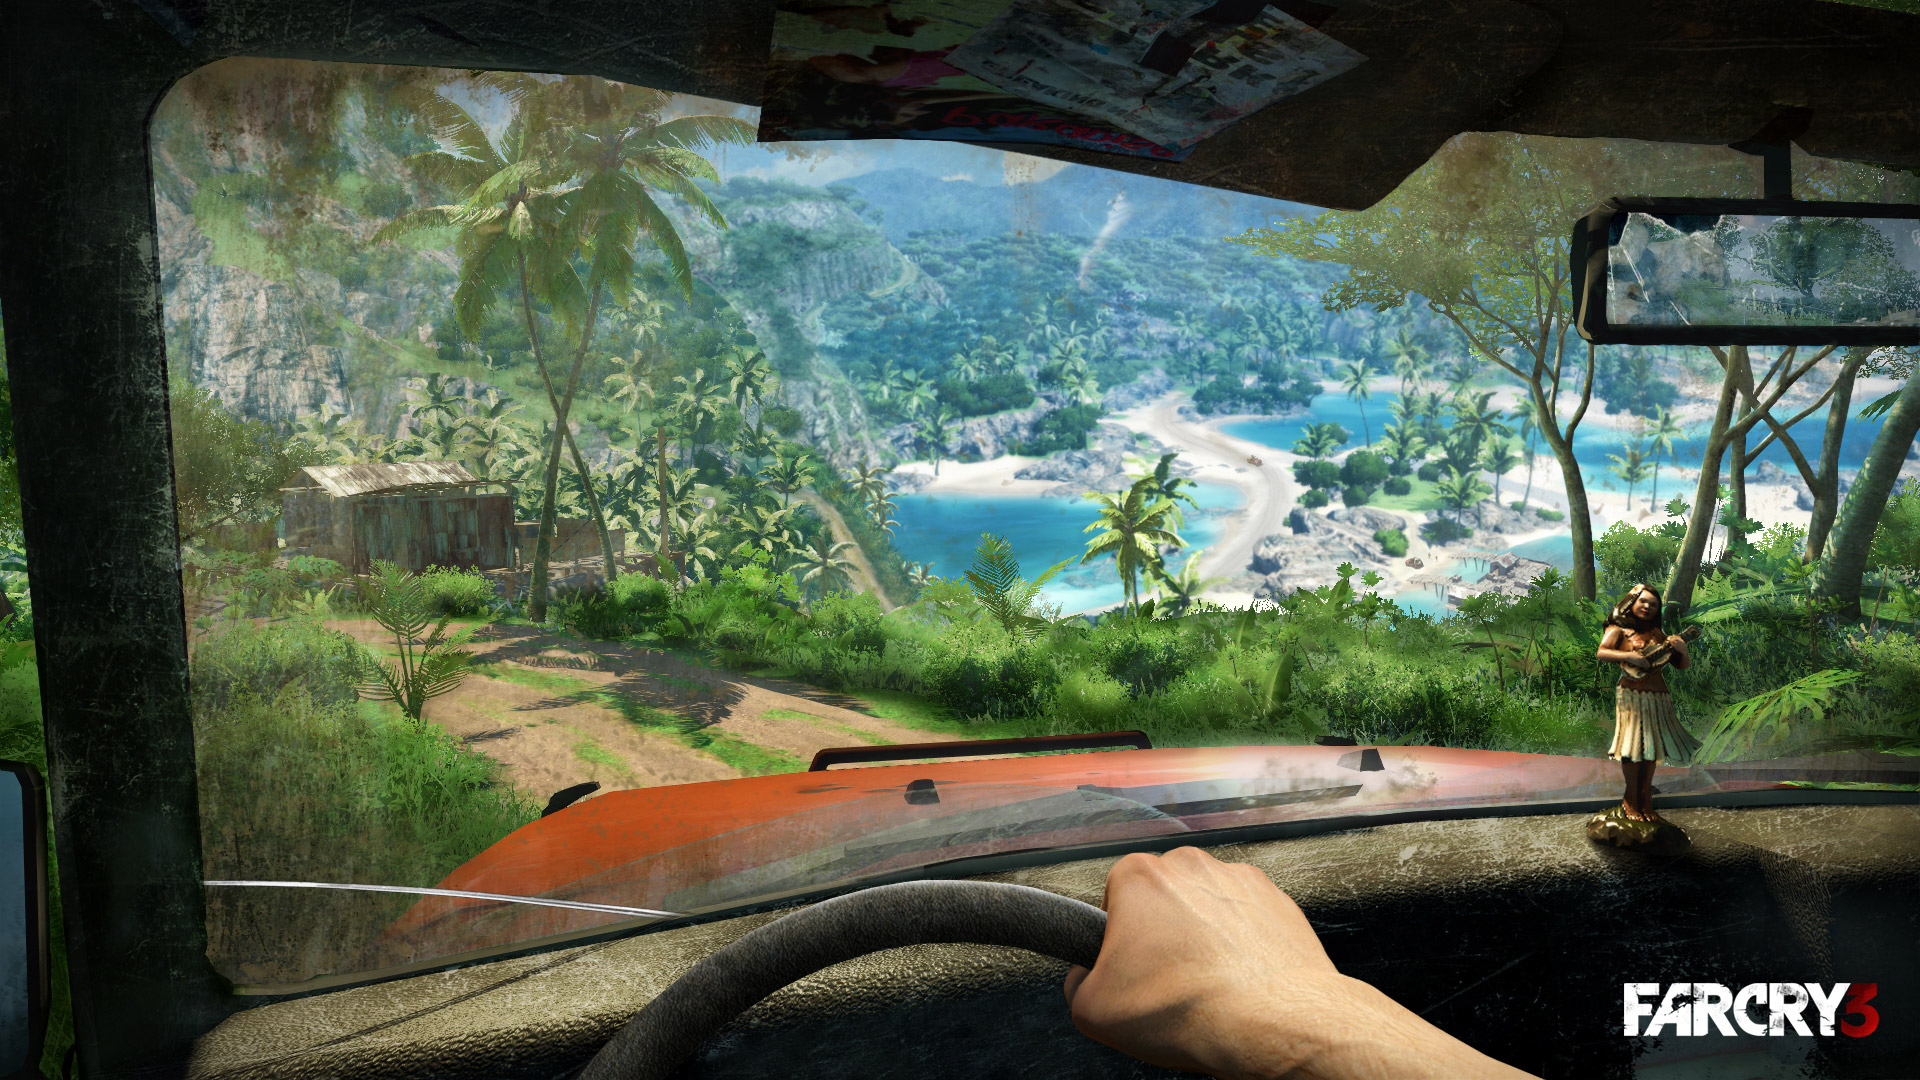 Free Far Cry 3 Wallpaper in 1920x1080